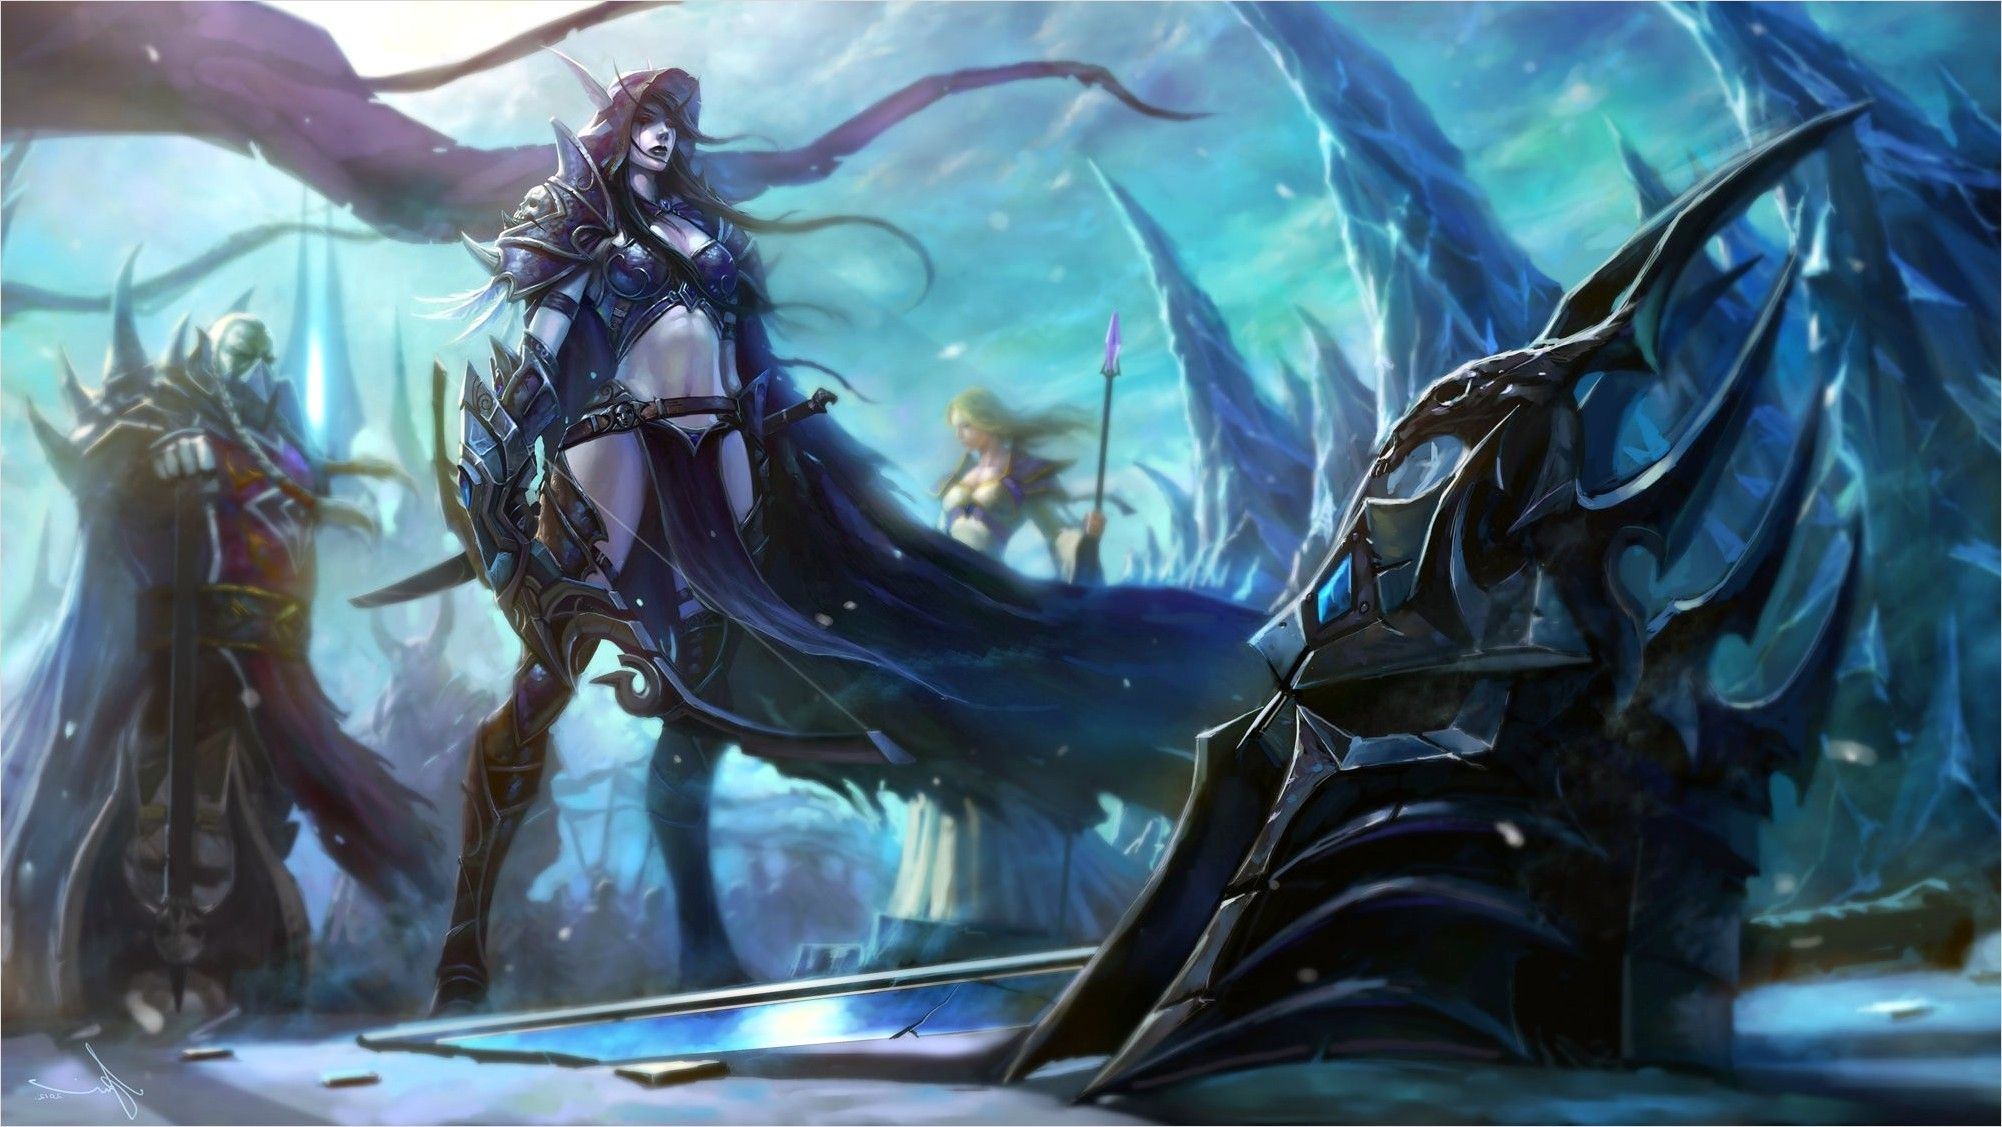 1920 215 1080 4k Lich King Wallpaper In 2020 Warcraft Art World Of Warcraft Wallpaper Sylvanas Windrunner